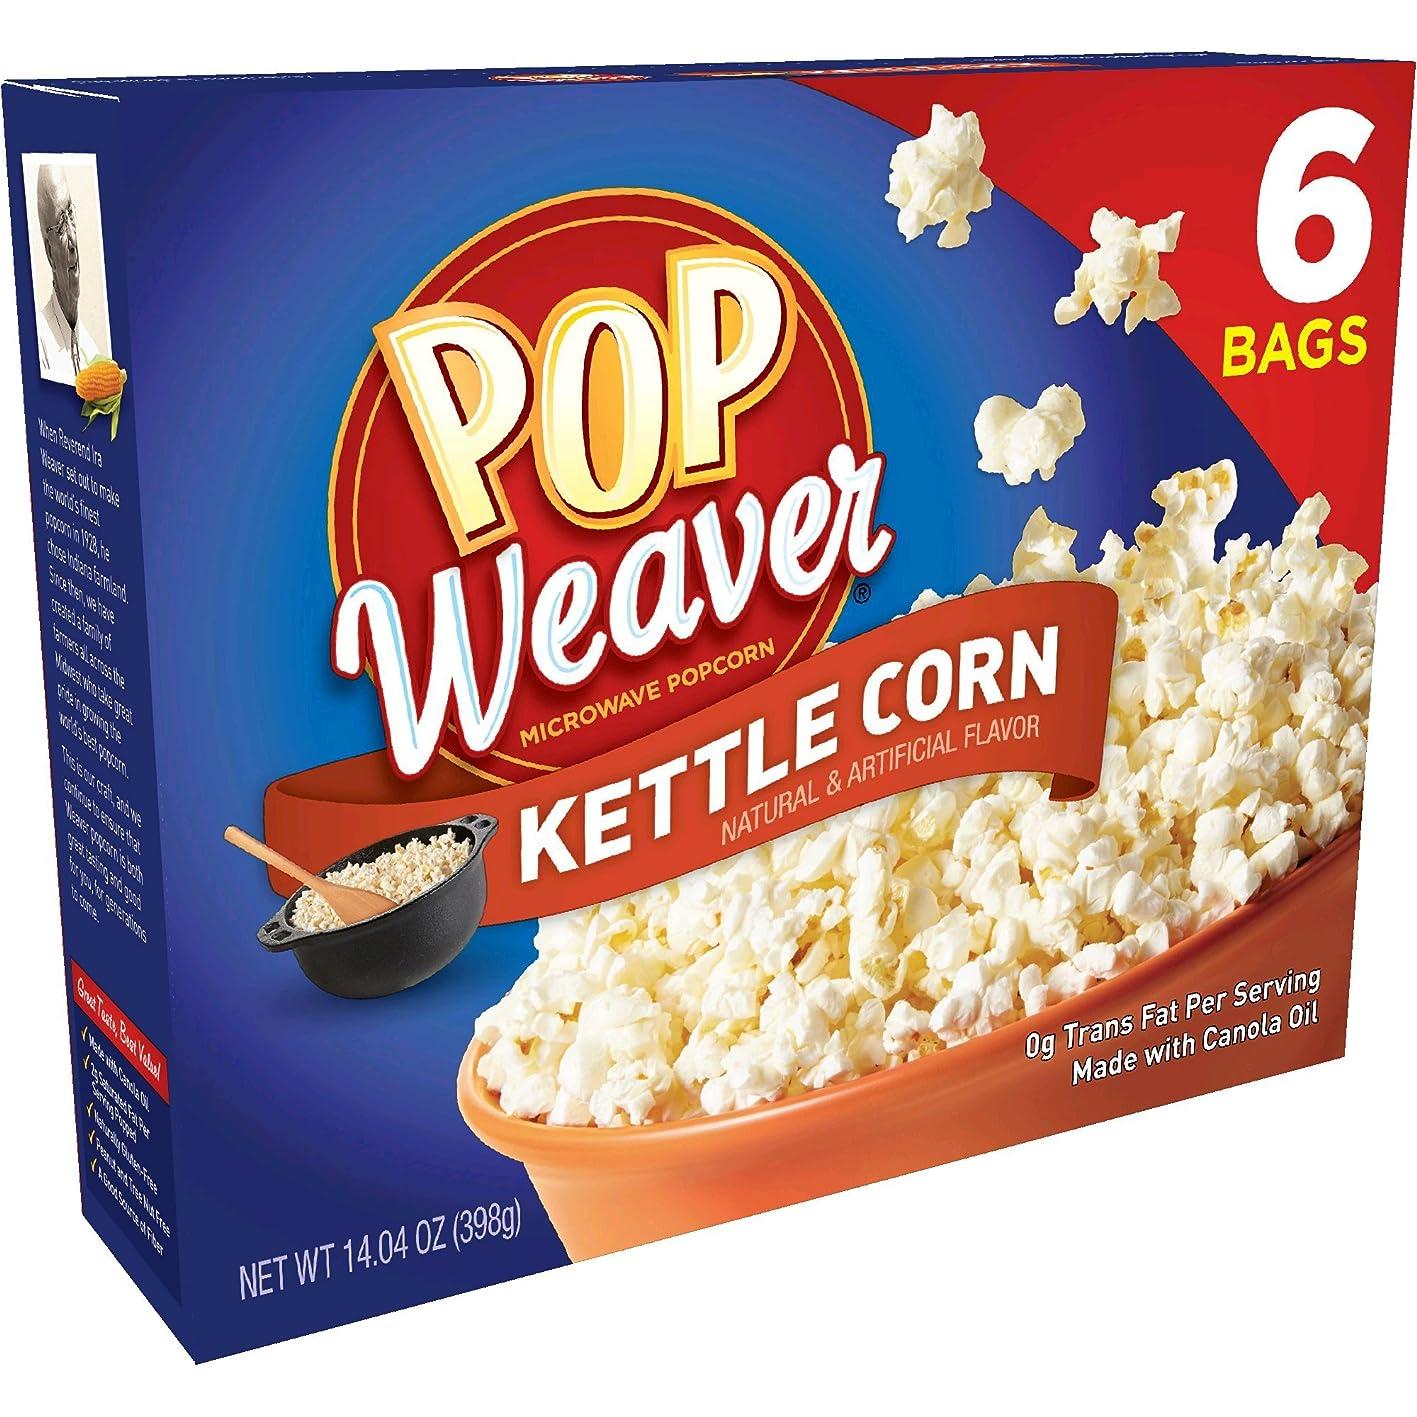 Pop Weaver Microwave Popcorn Kettle Corn 6 Bags iwxnacrhlfd310